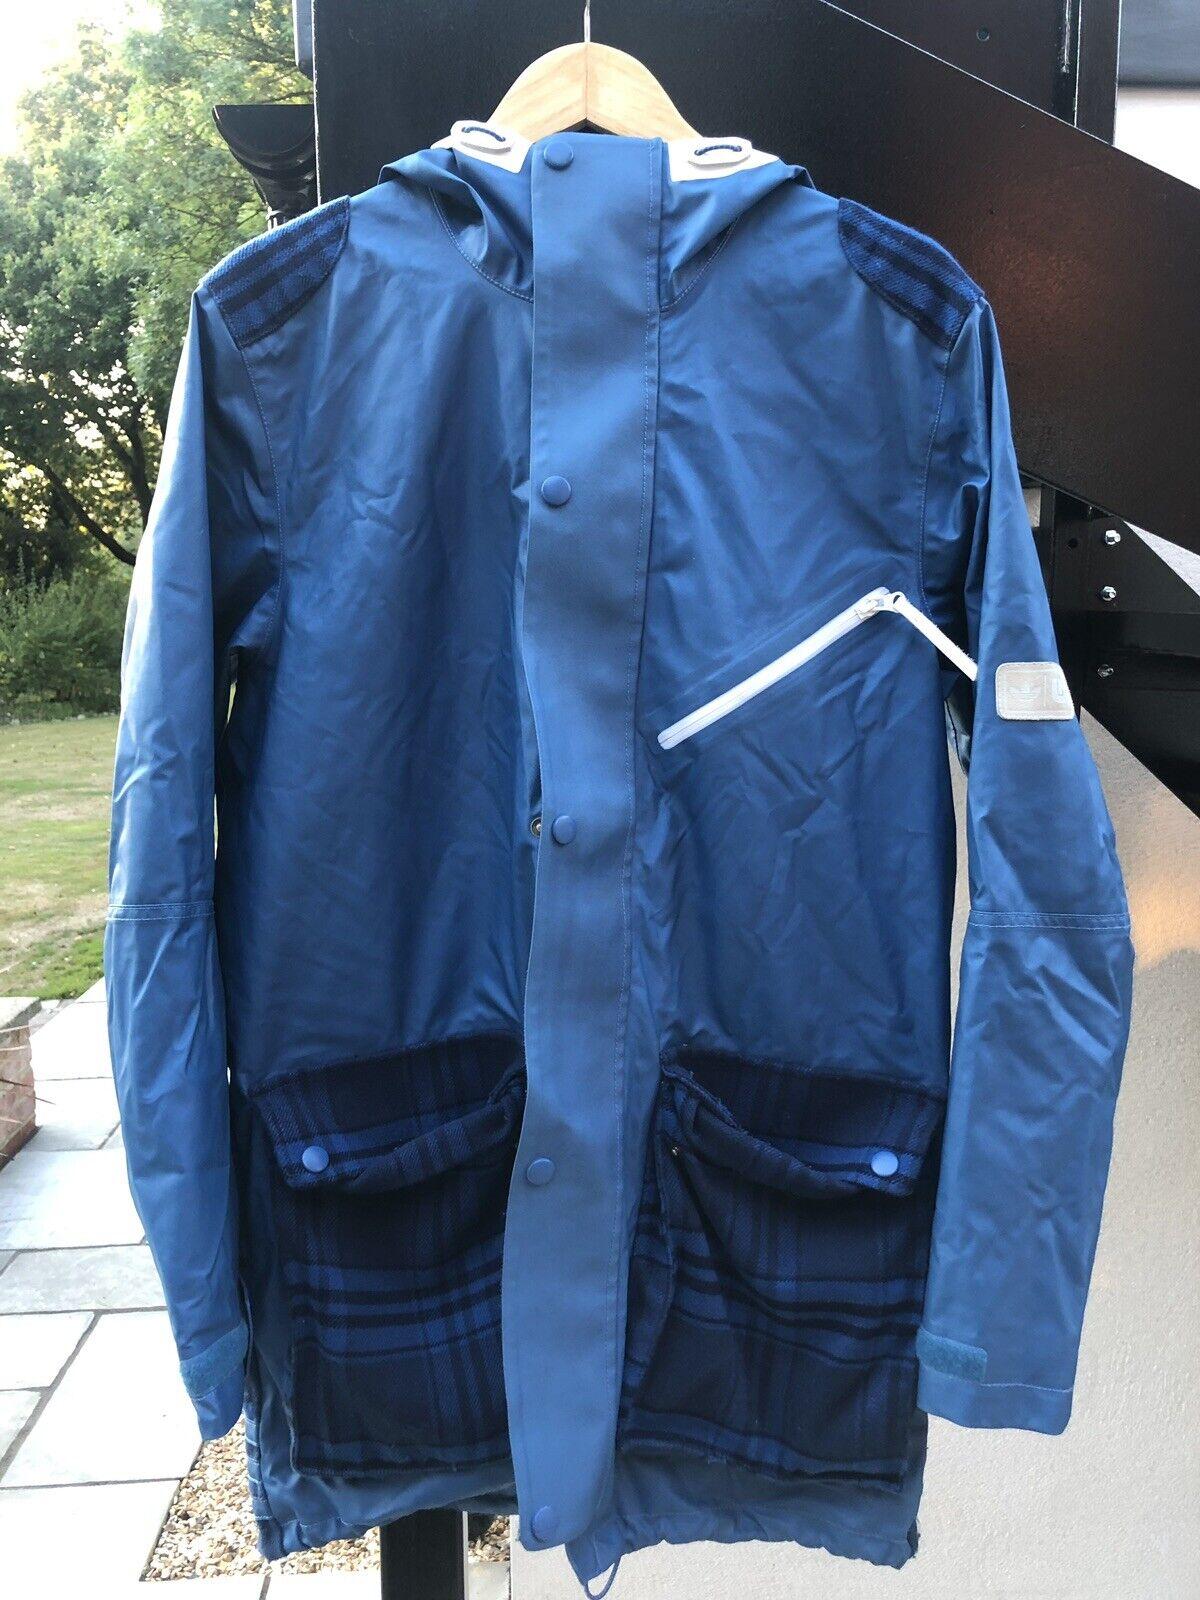 Burton and Adidas Originals, Gluhwein Snowboarding Coat jacket (RARE)